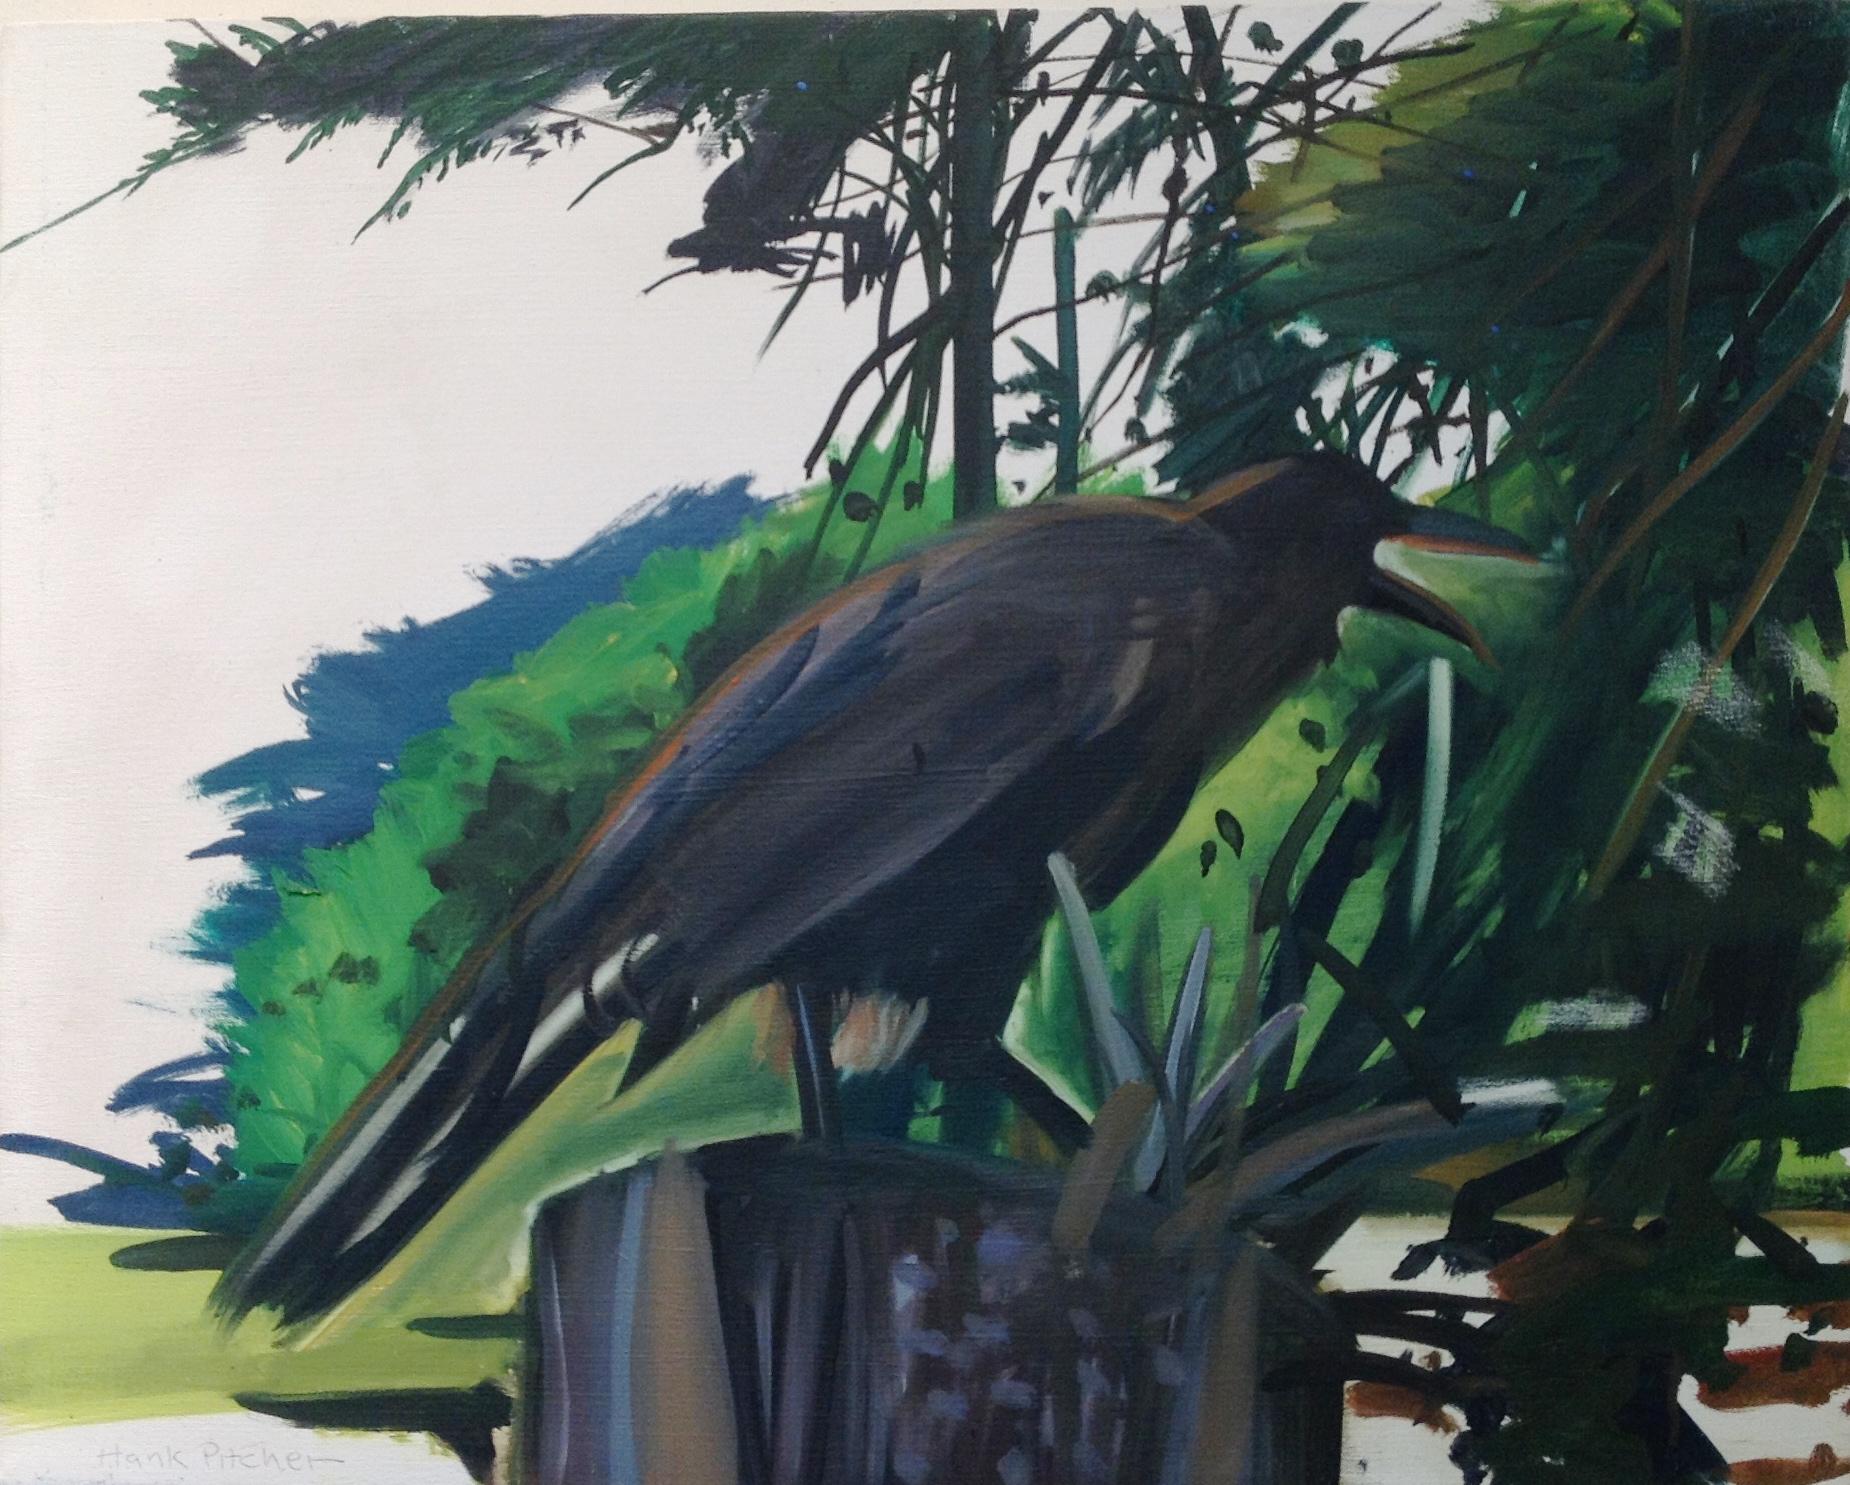 Title:   A Crow on a Stump    Medium:  Oil om Canvas   Size:  24 x 30